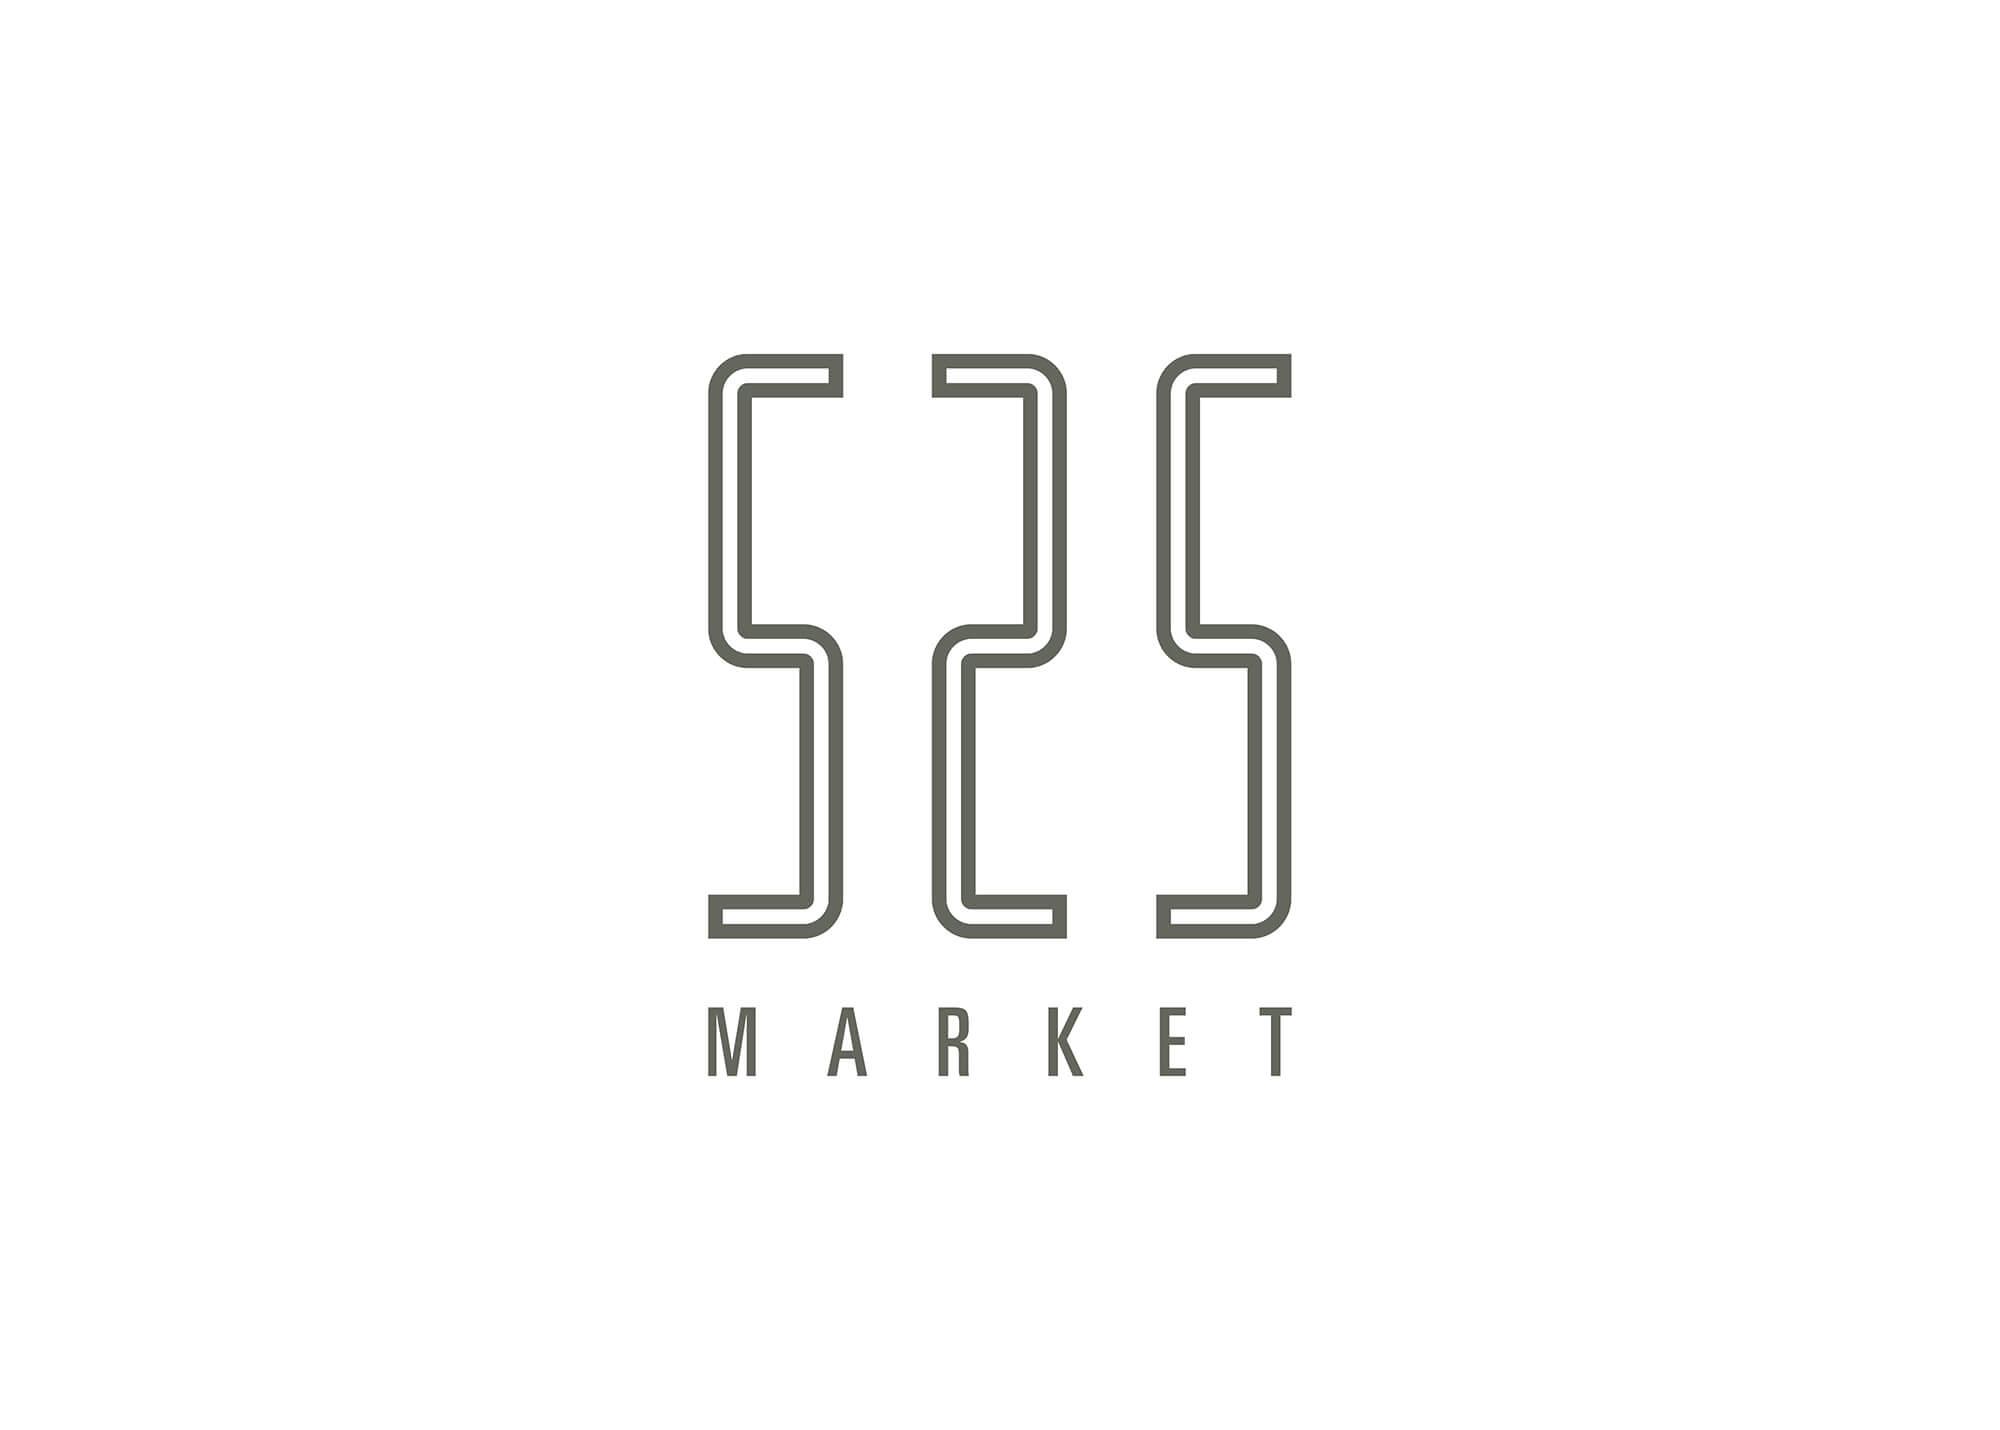 525 Market